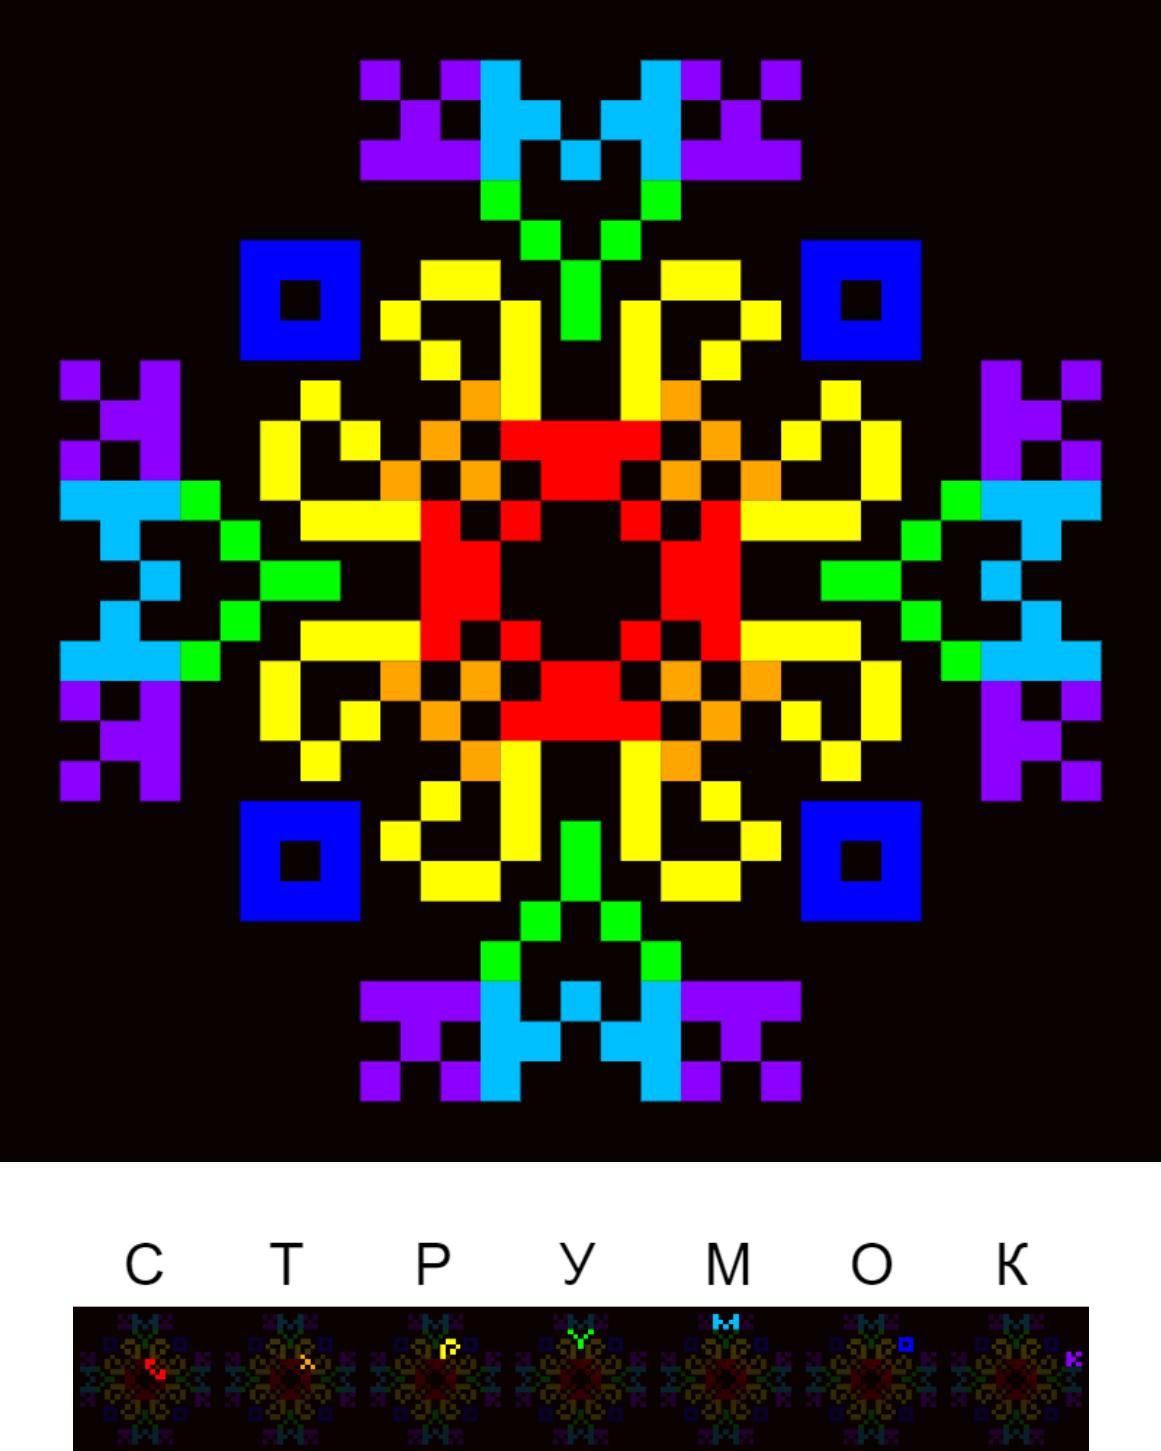 Текстовий слов'янський орнамент: Струмок